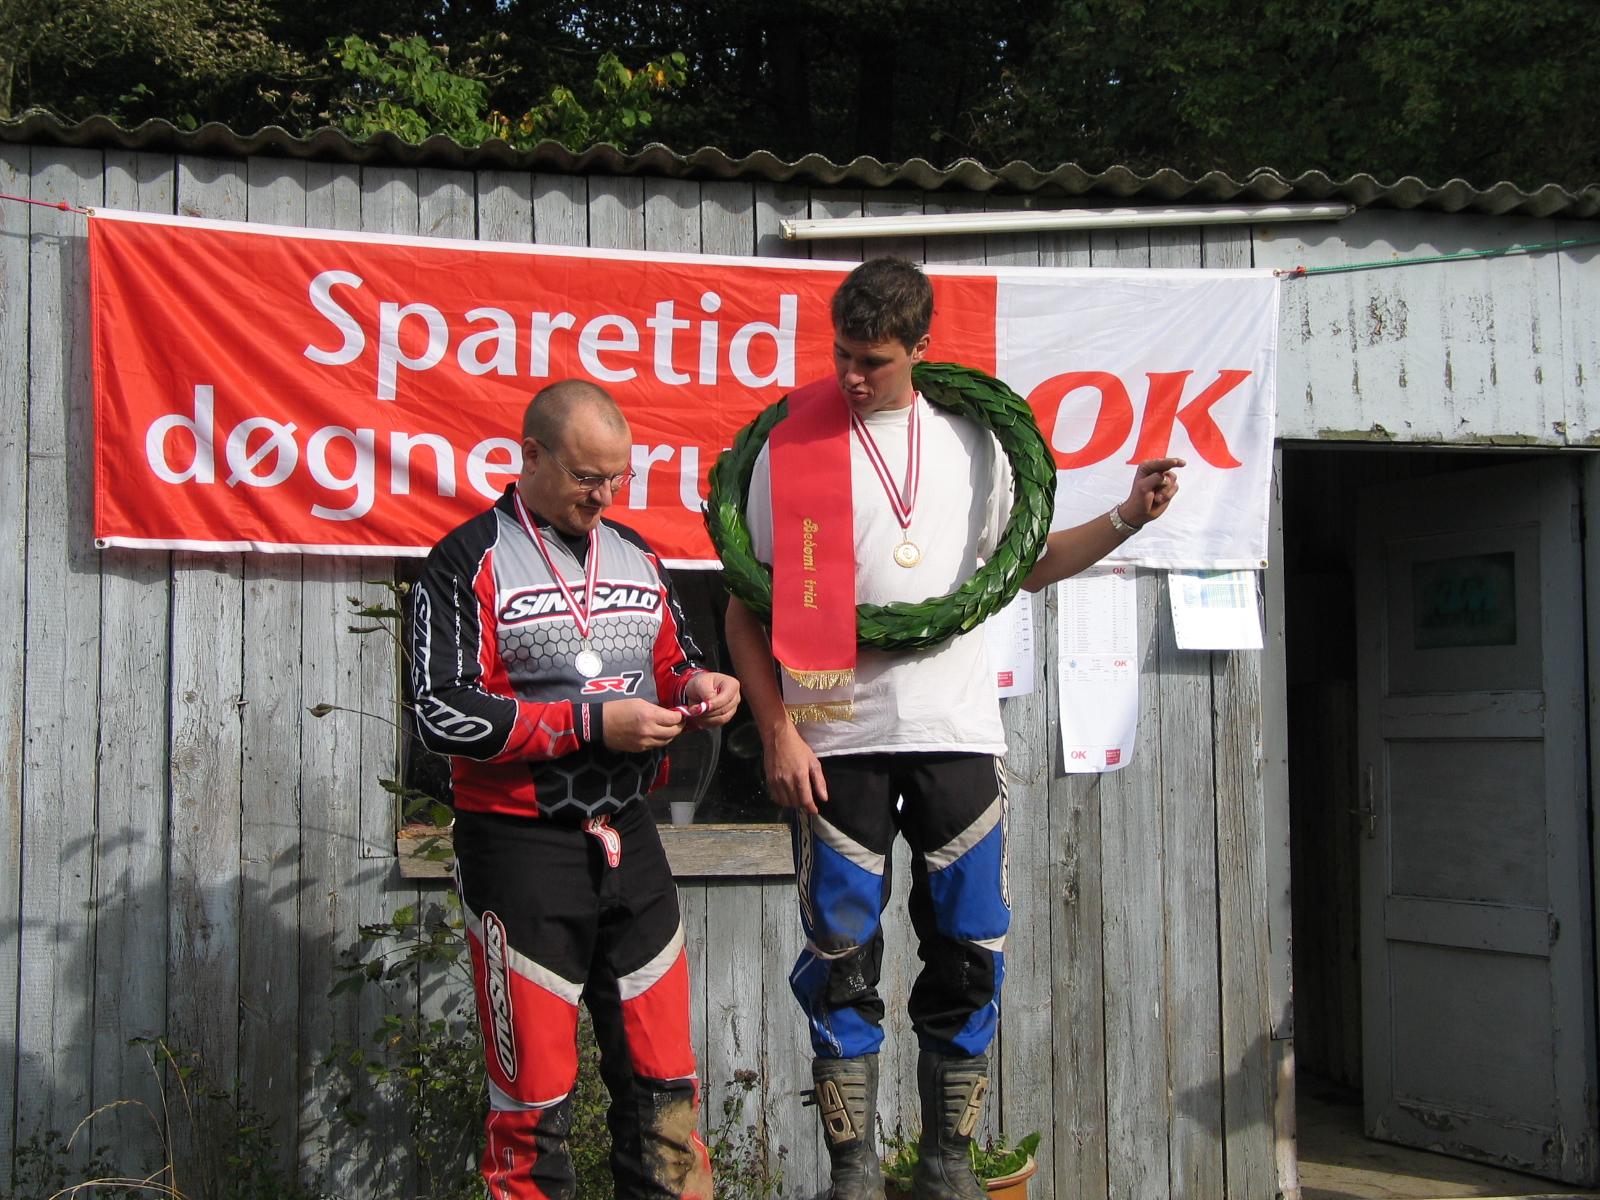 Thomas Pedersen vandt DM guld foran Hans J. Beck